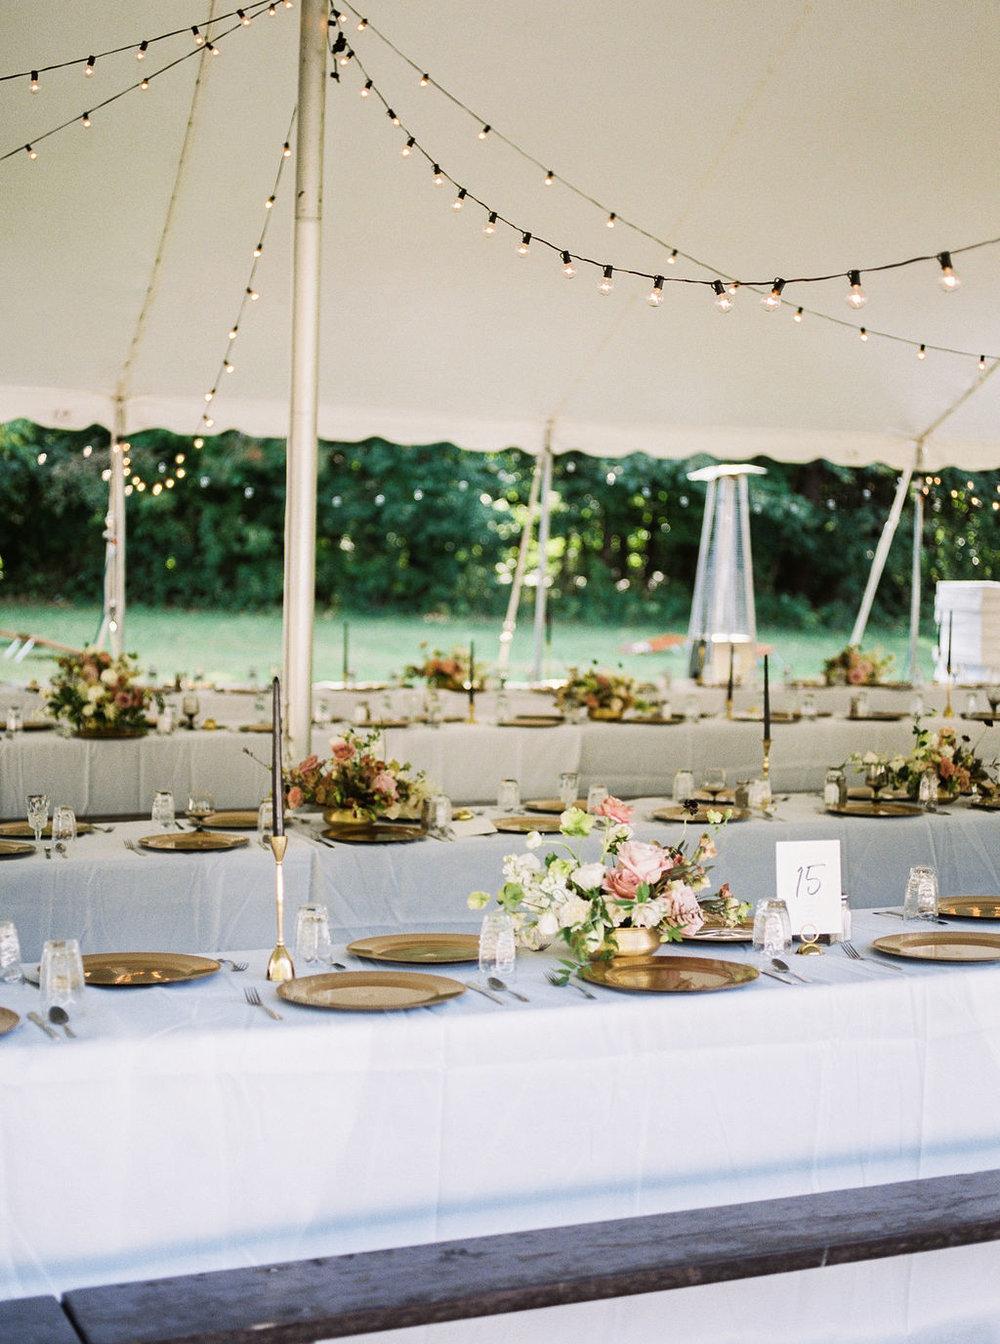 SplendidMusings-AshleyEvanWedding-172.jpgCamp-Sturtevant-Wausau-Wedding-Florist-KaseStyles-18-.jpg